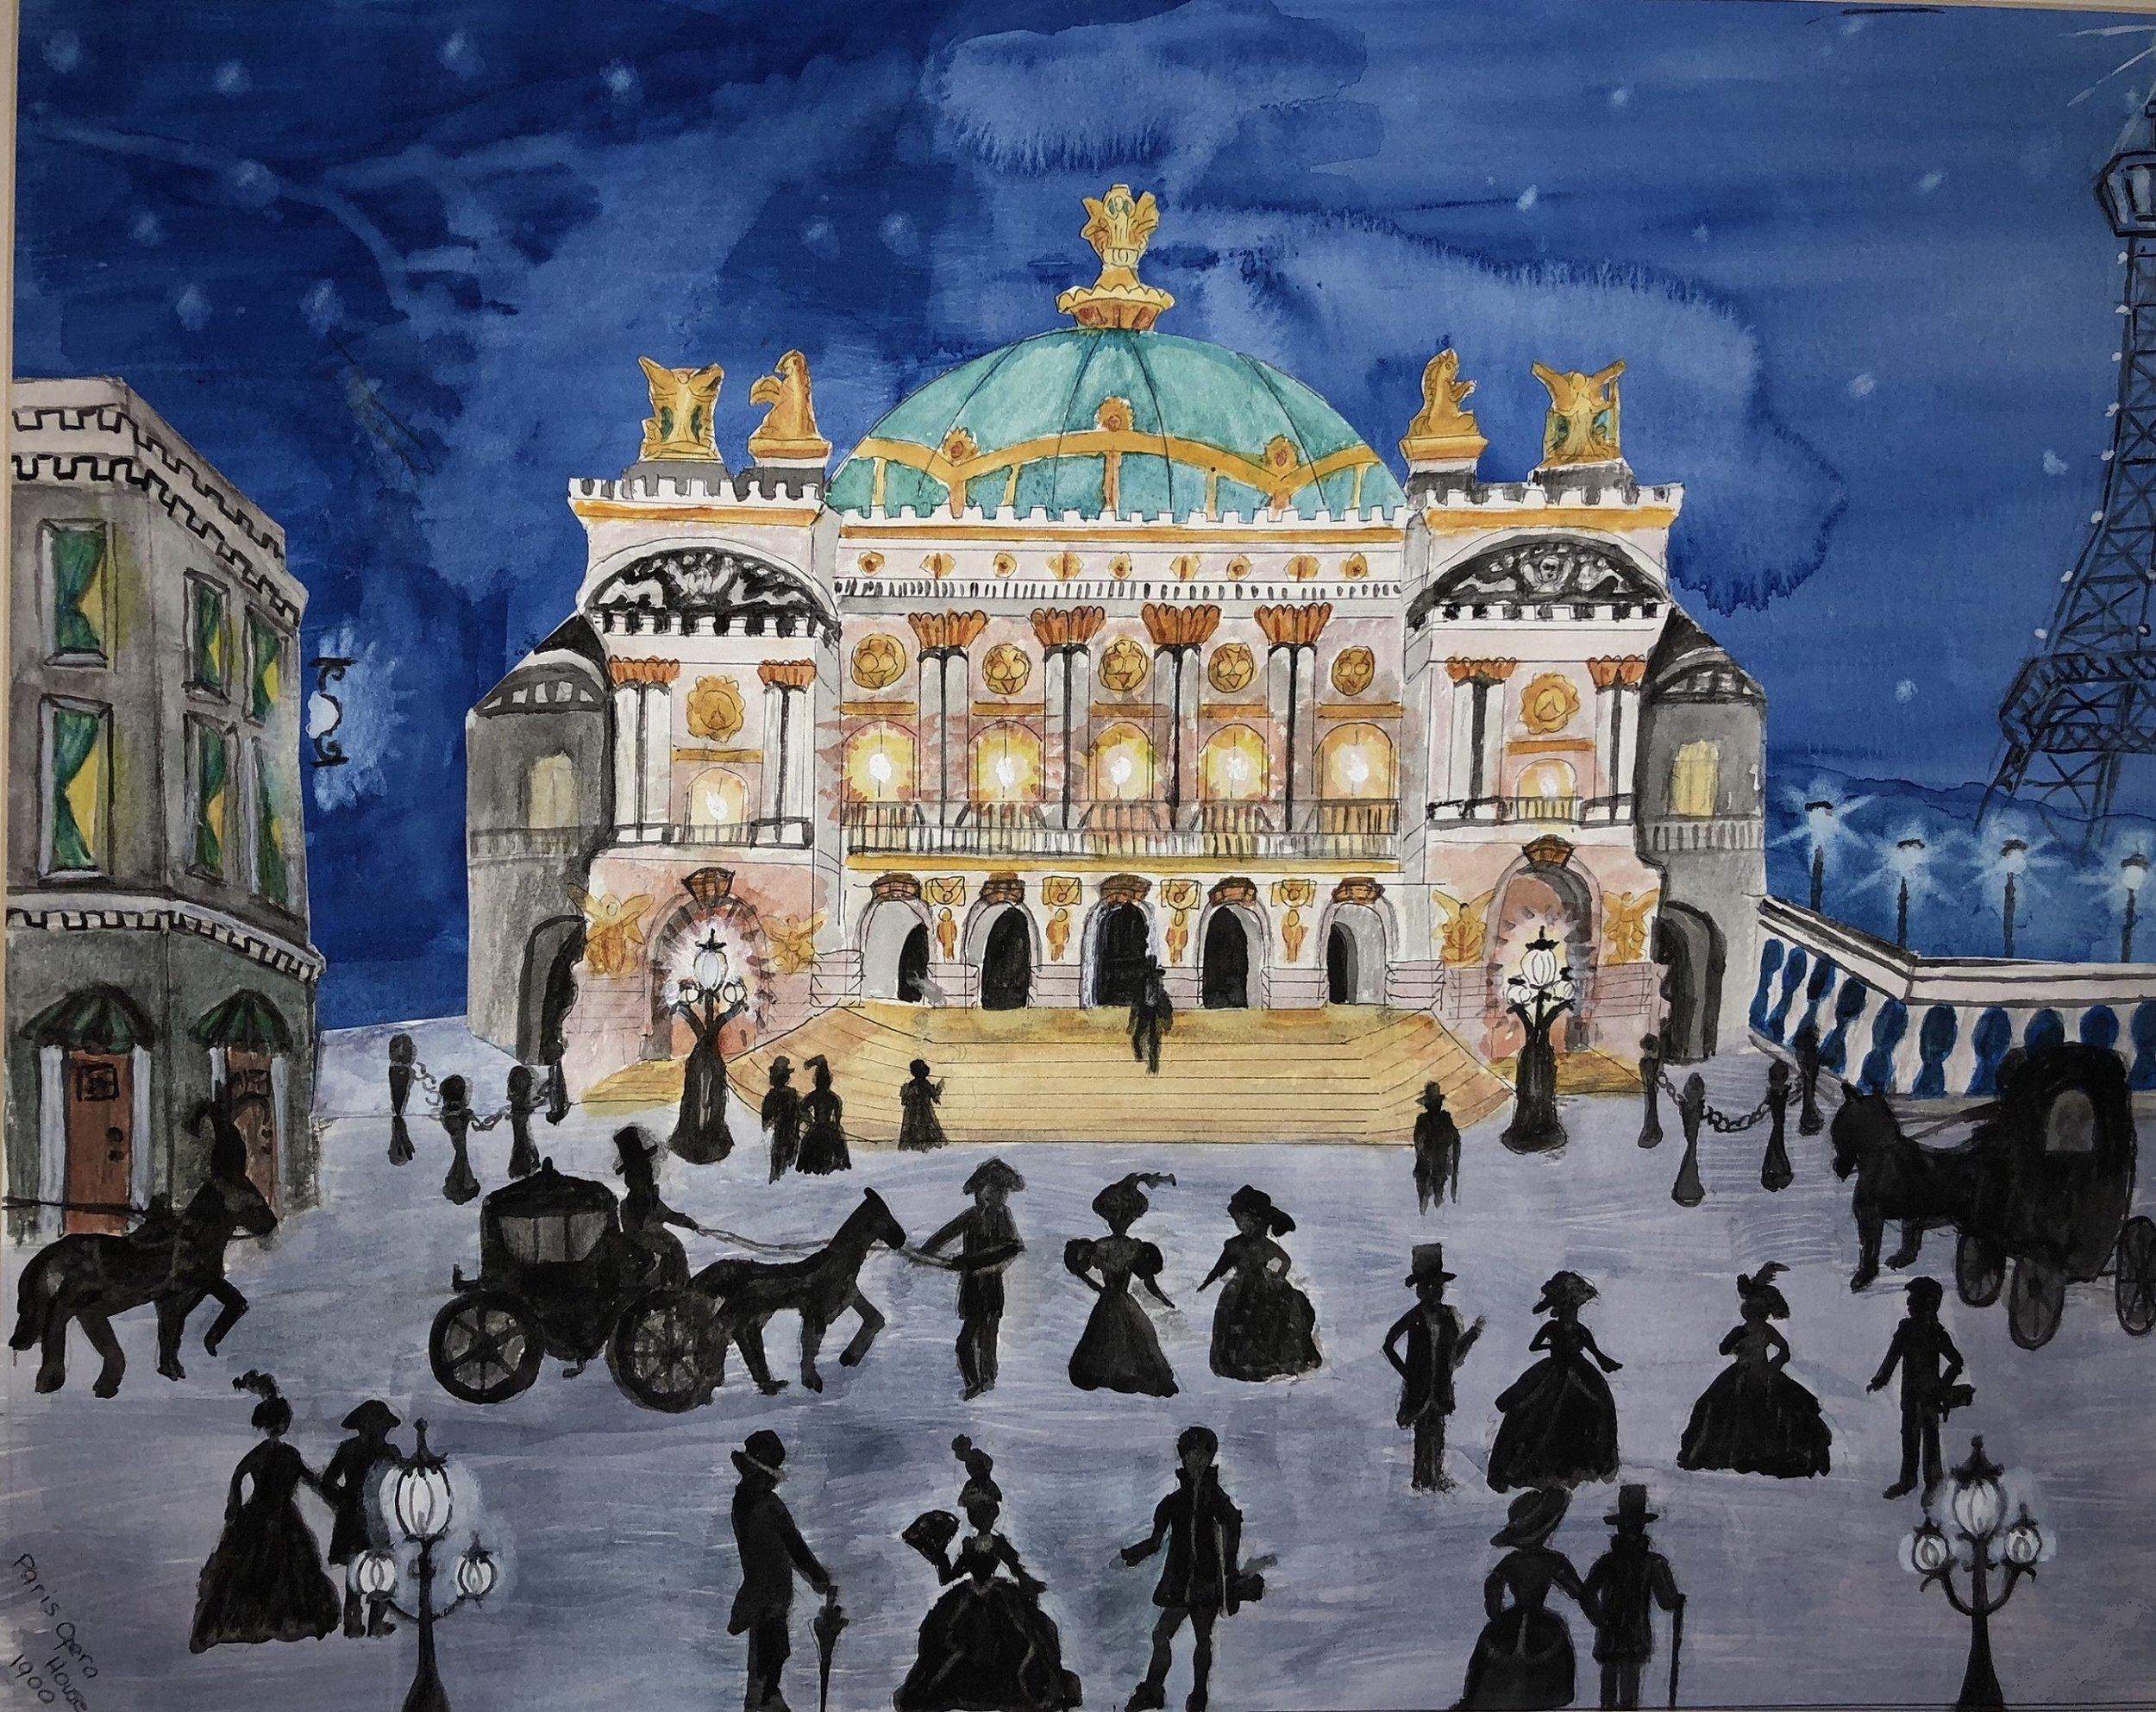 Paris Opera House 1900s, Rosemarie Macher